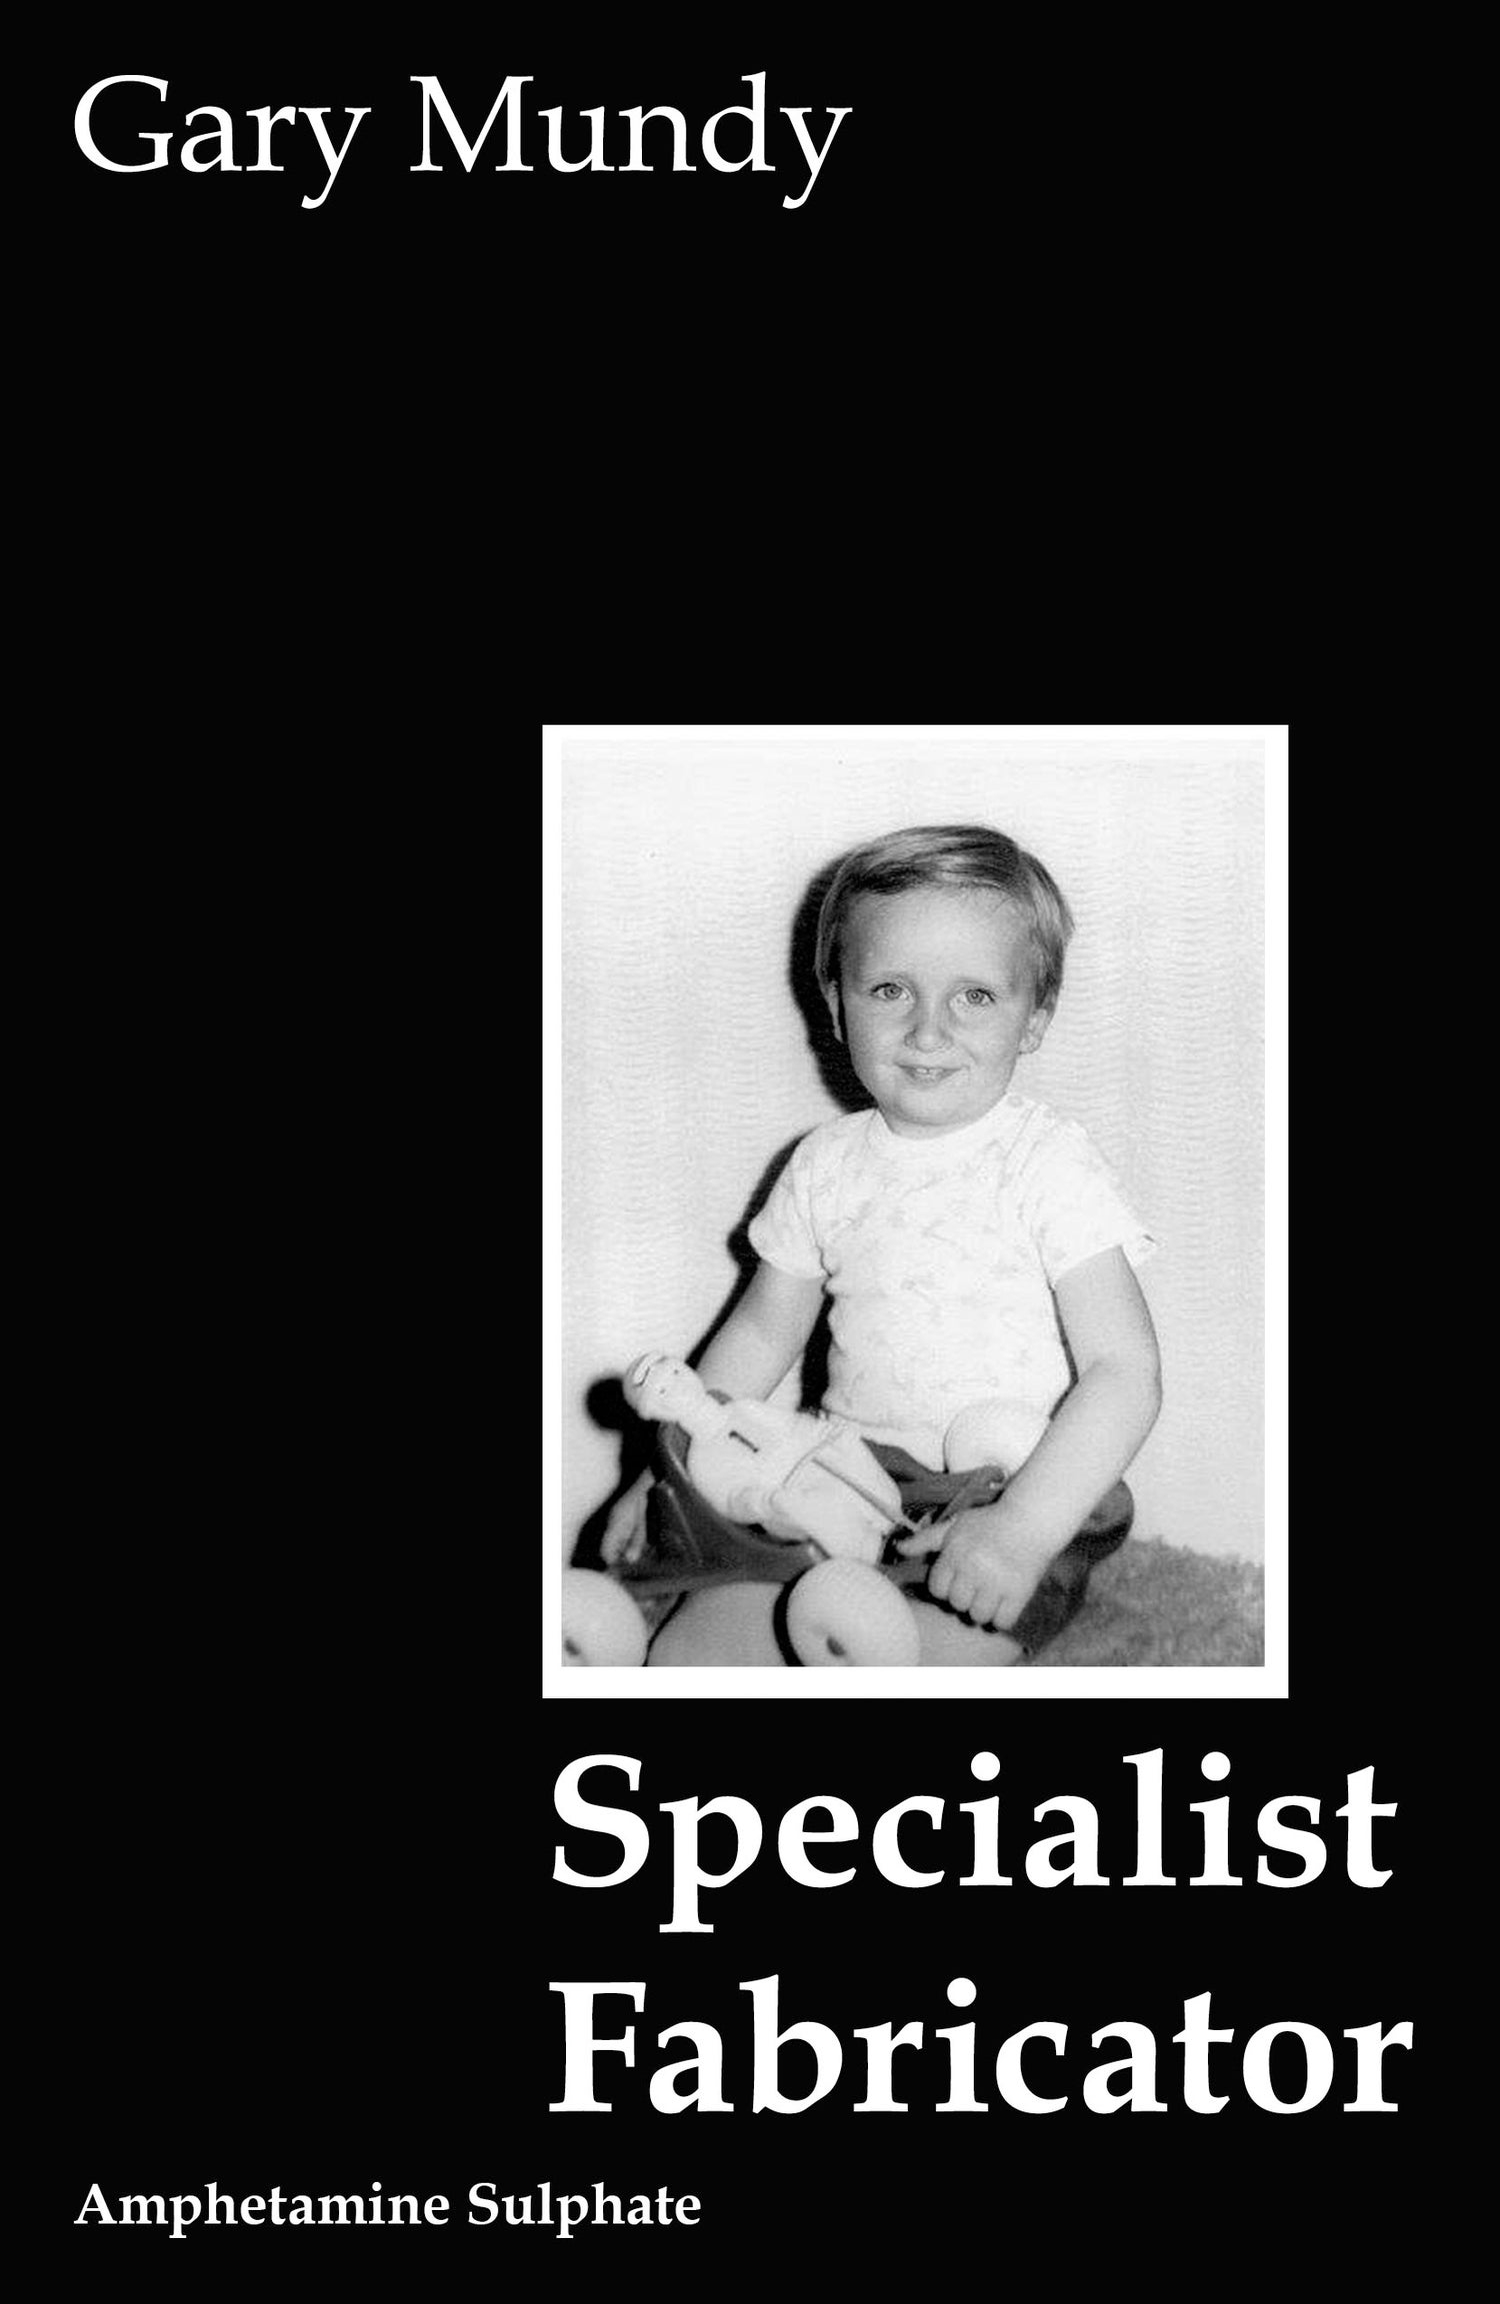 Image of <b>Specialist Fabricator</b> <br>Gary Mundy